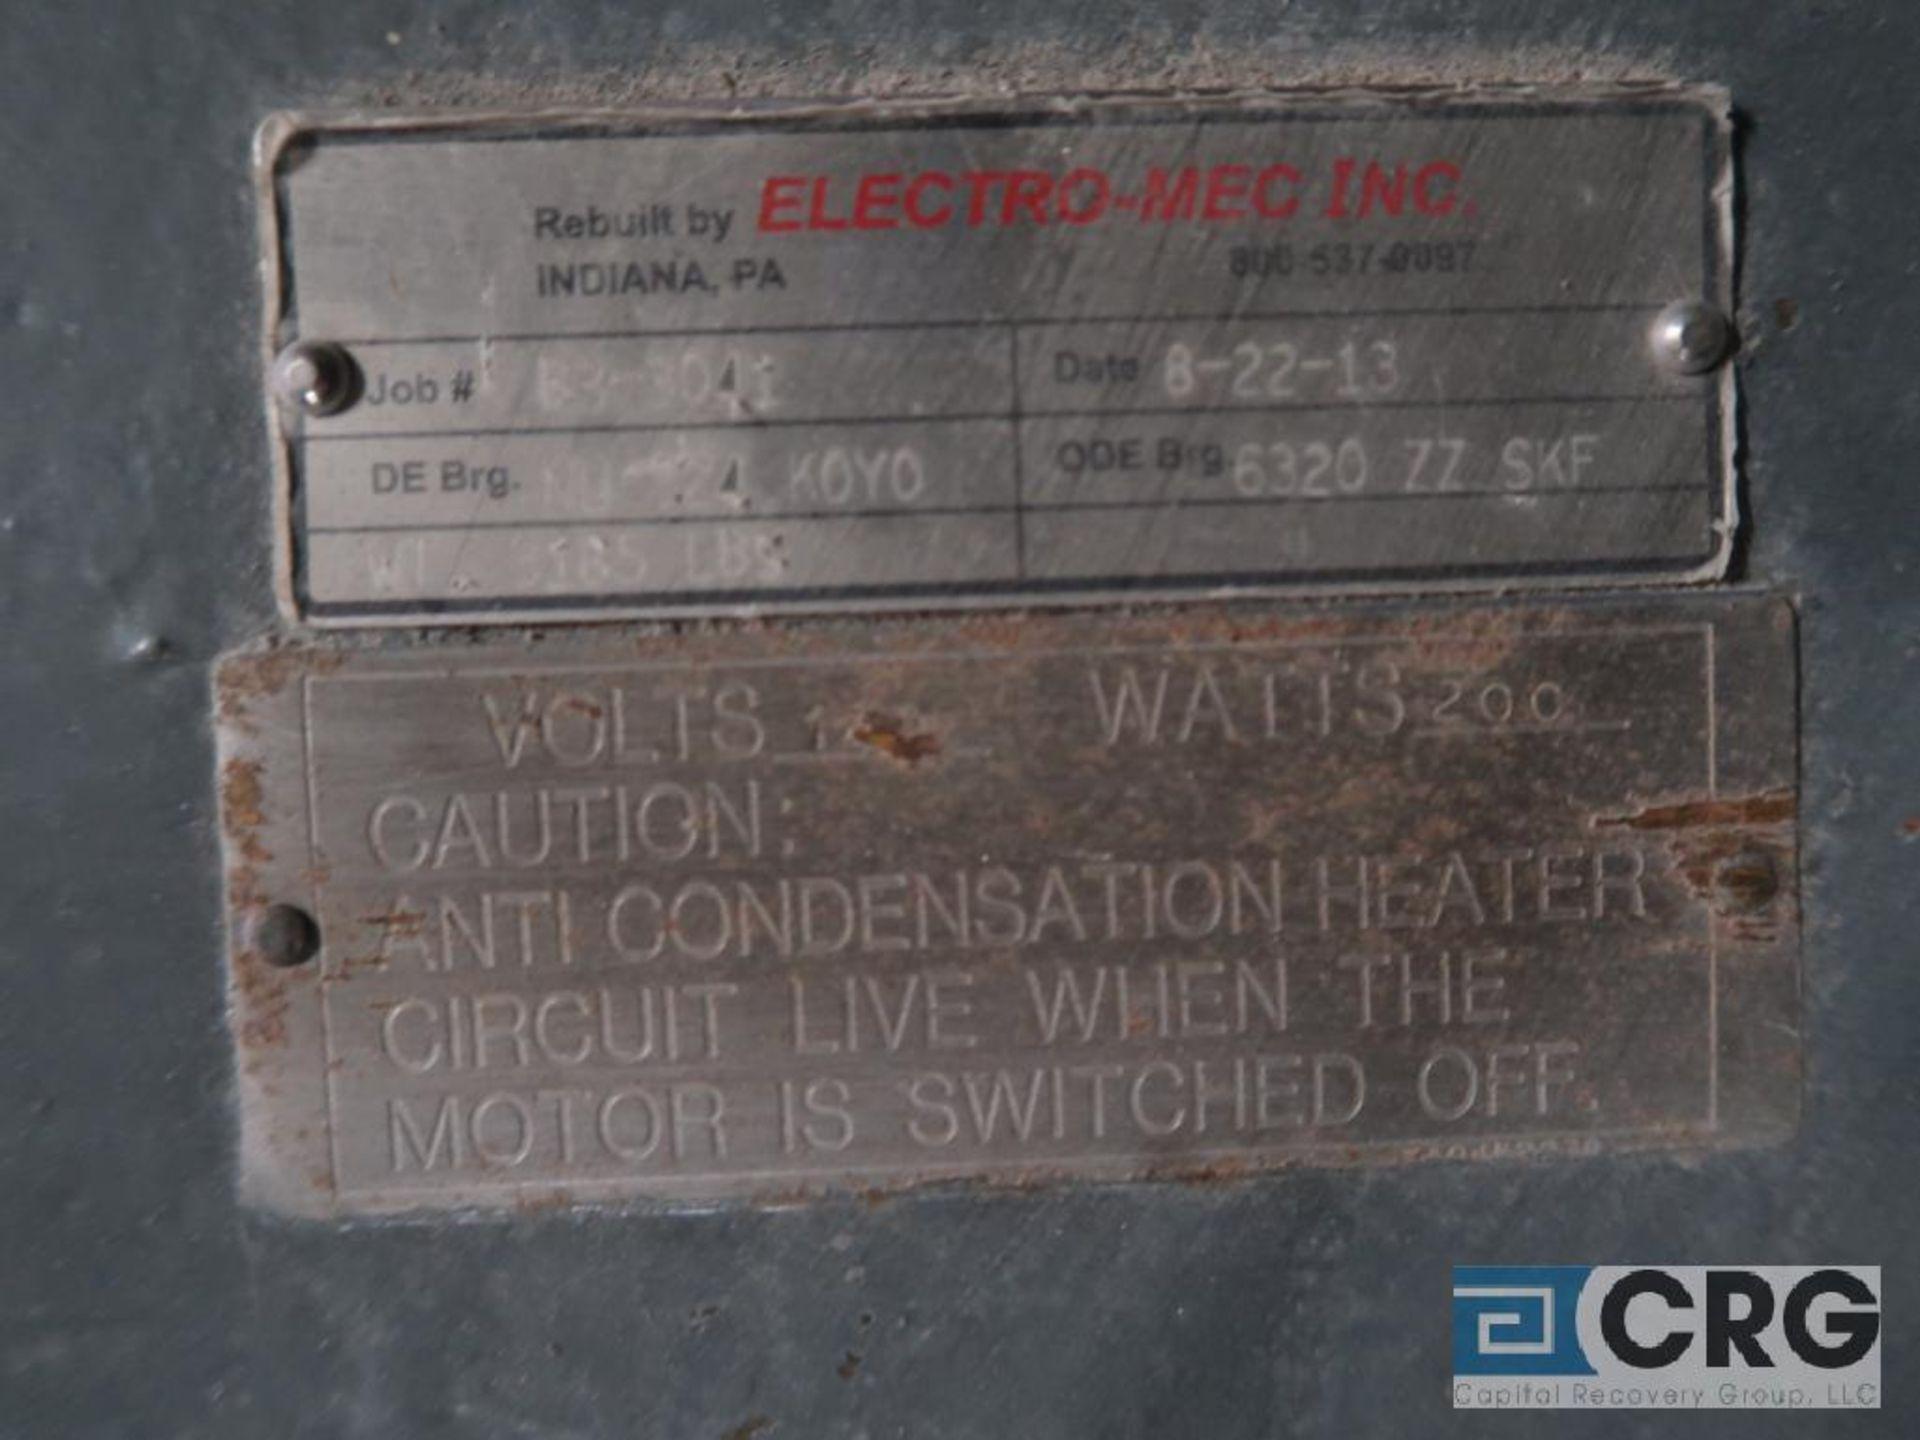 Teco motor, 250 HP 1,170 RPM, 2,300/4,160 volts, equipment #E04776 (496 Dock Area) - Image 2 of 2